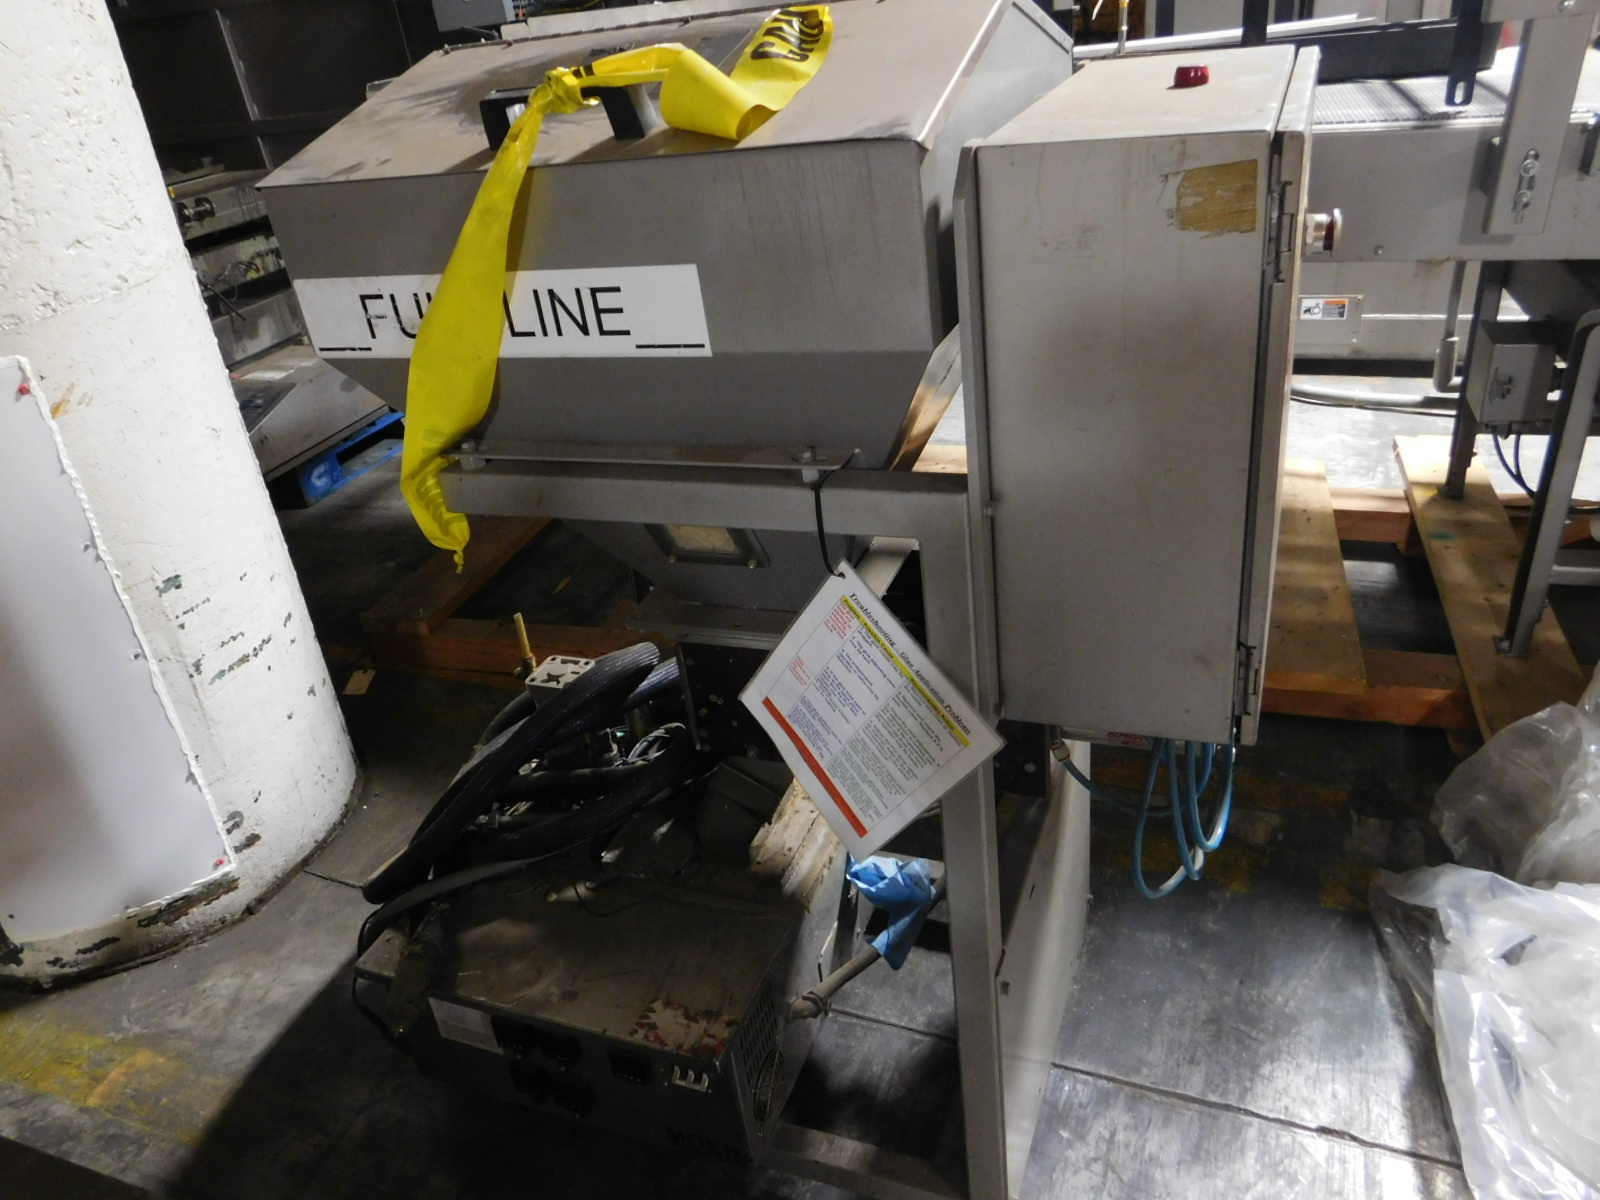 Lot 23 - Moem Glue Glue Melter ,240V,15AMPS, PHASE 3, M3A PF106-BIFQ,SN:1049,MFG. 3-2003 :equipment located